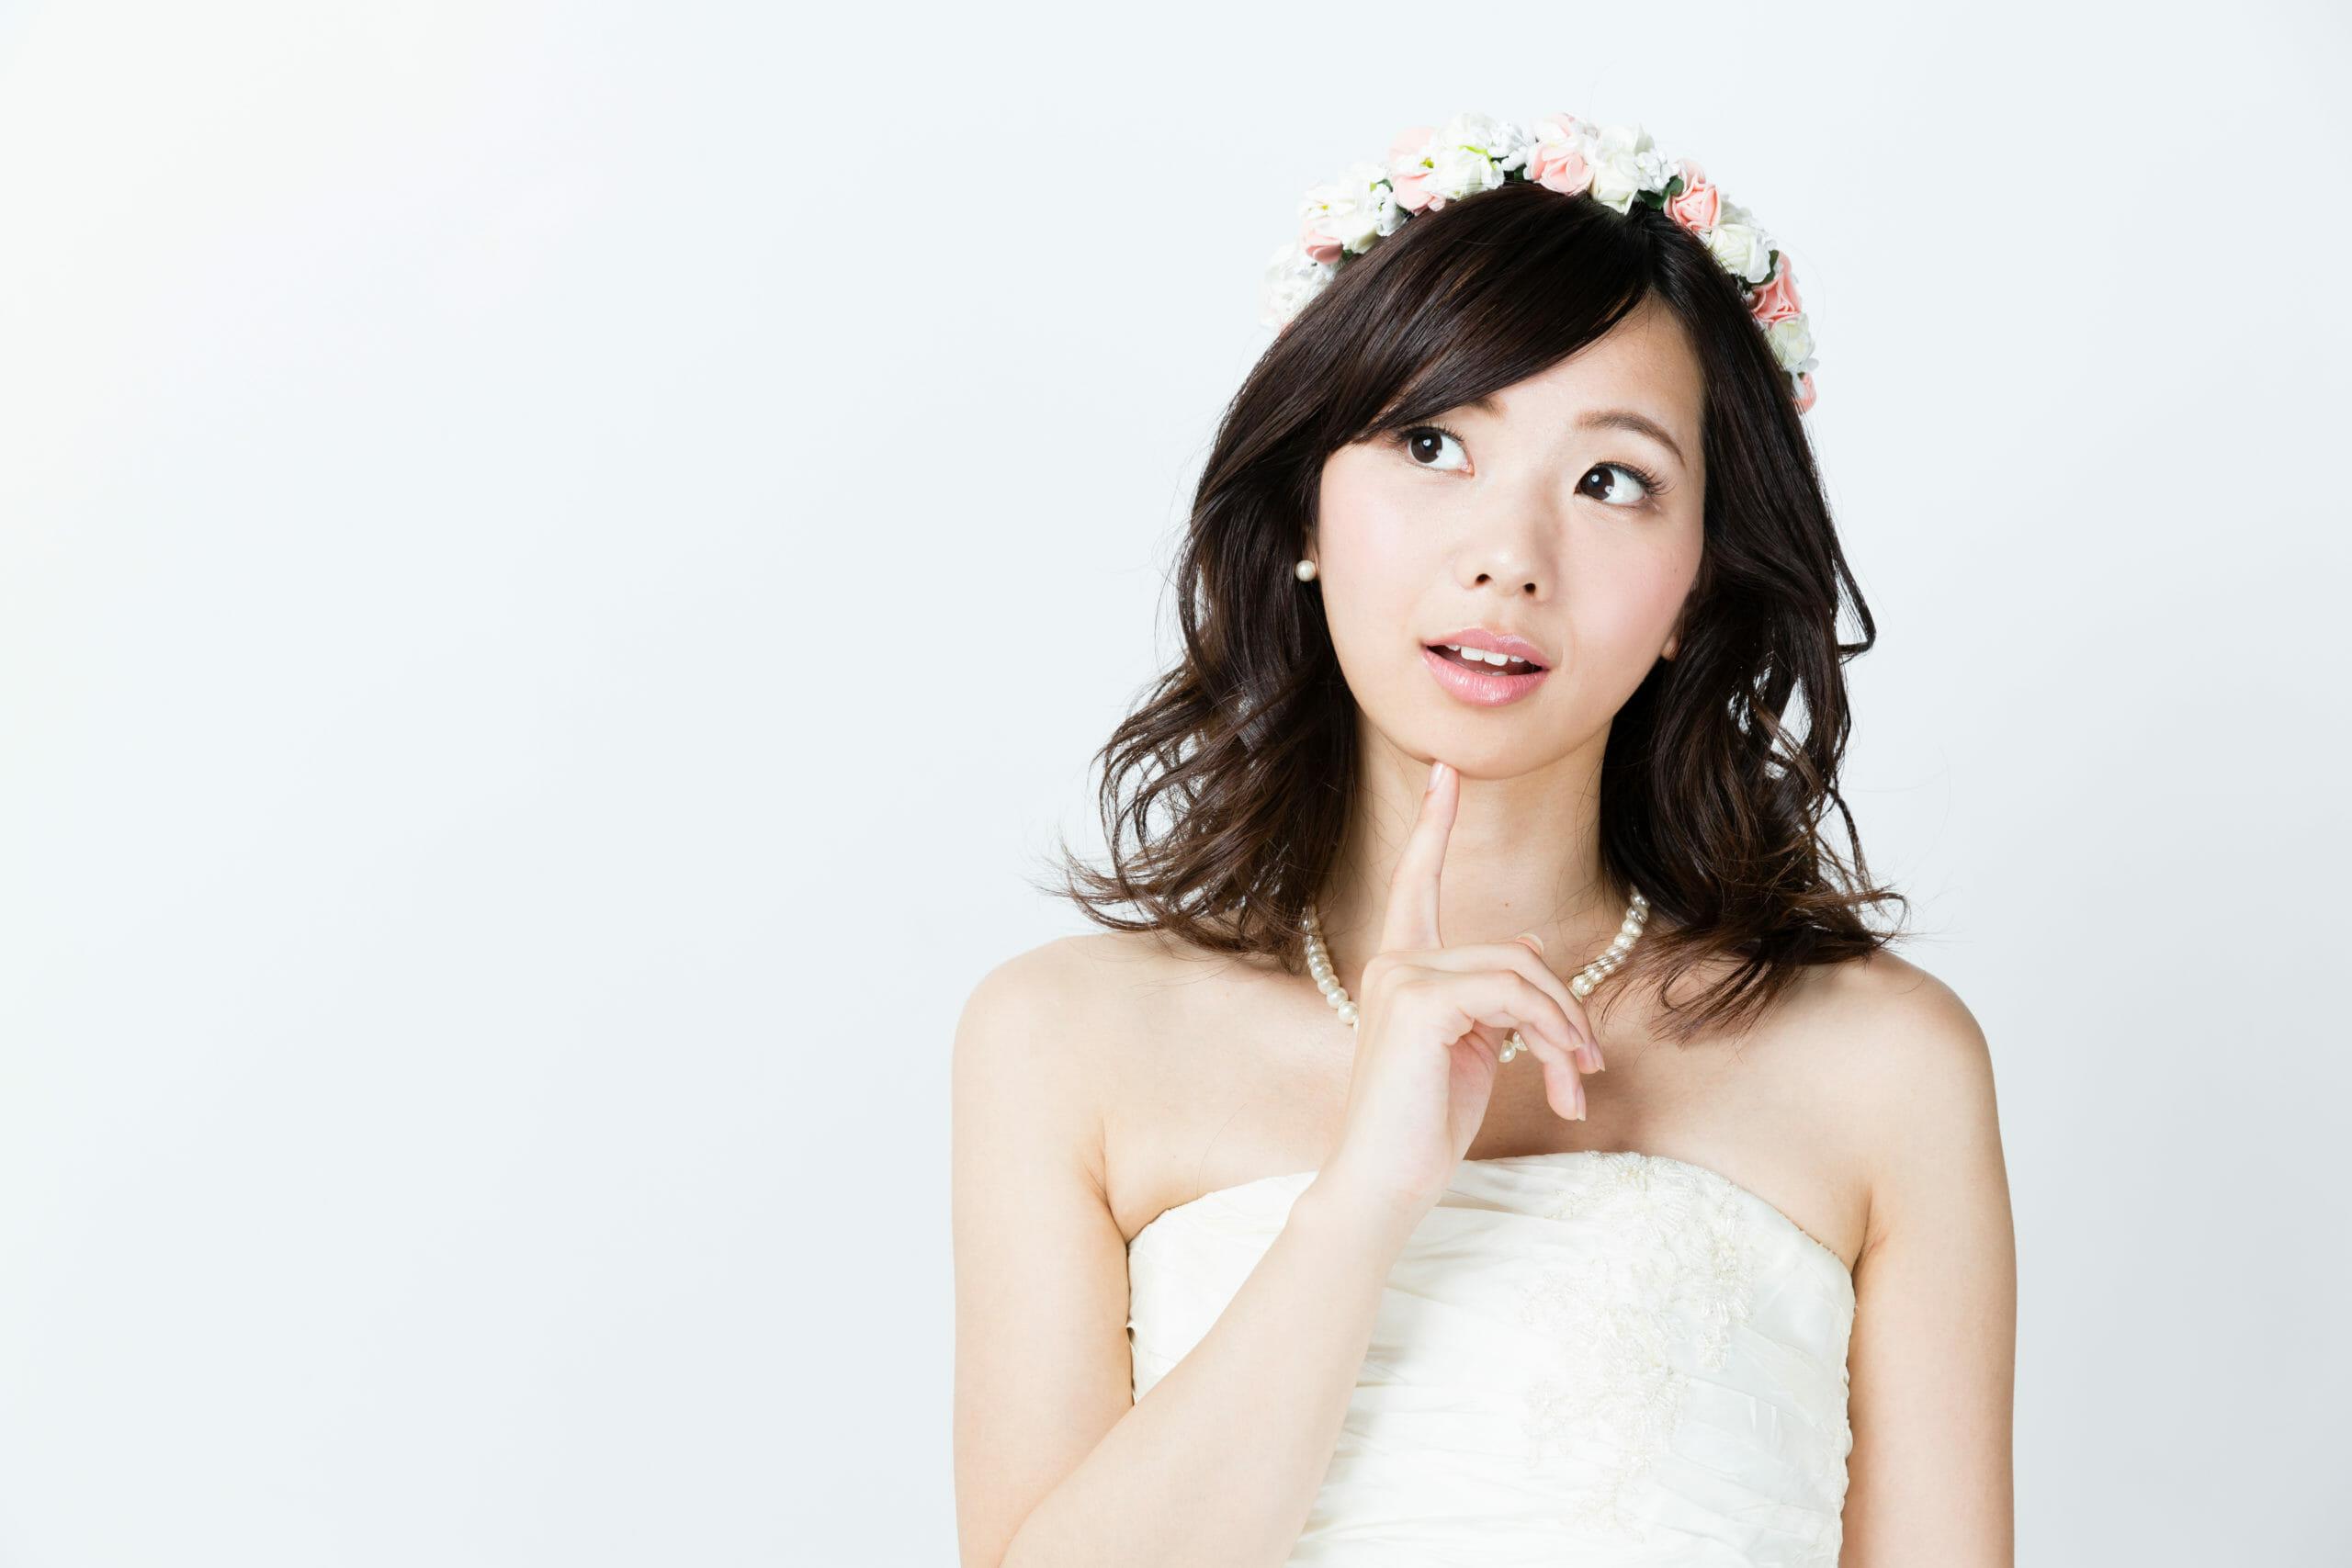 portrait-attractive-asian-woman-wearing-wedding-496421779